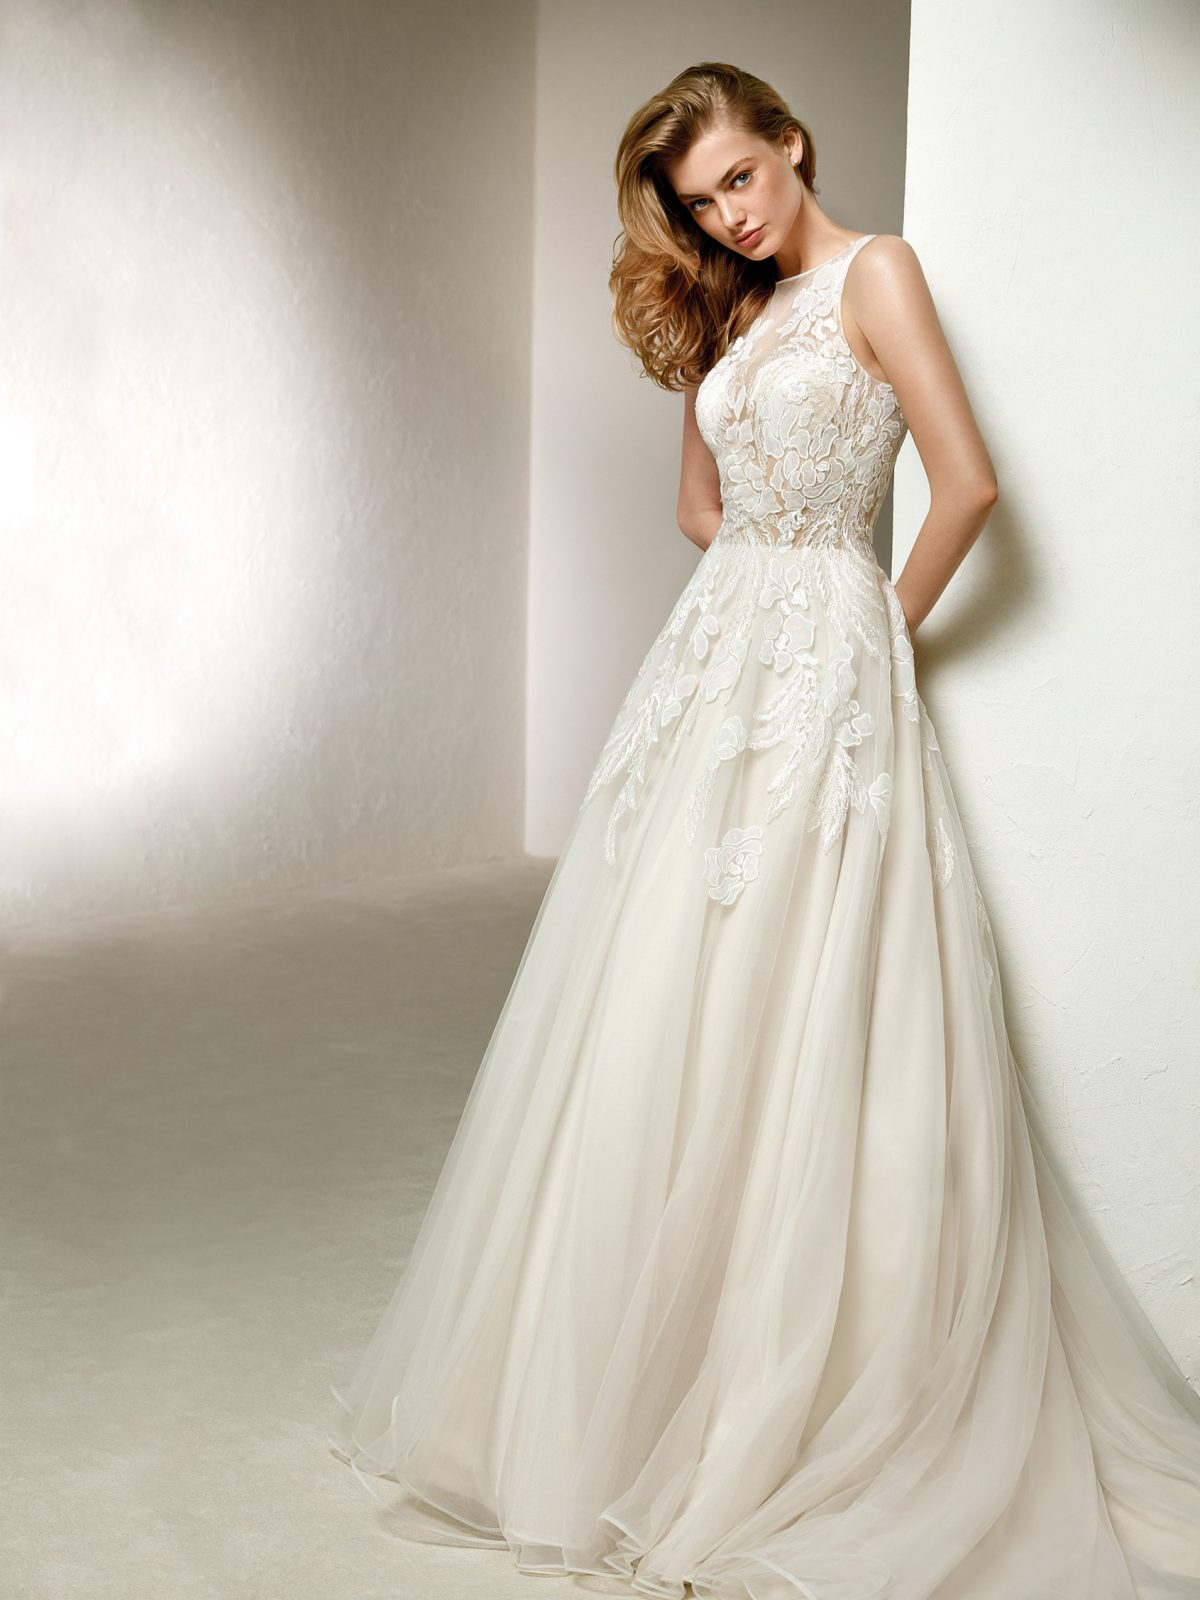 WEDDING DRESS SALE - Pronovias Dola ROMANTIQUE BRIDAL MAGHERAFELT NORTHERN IRELAND